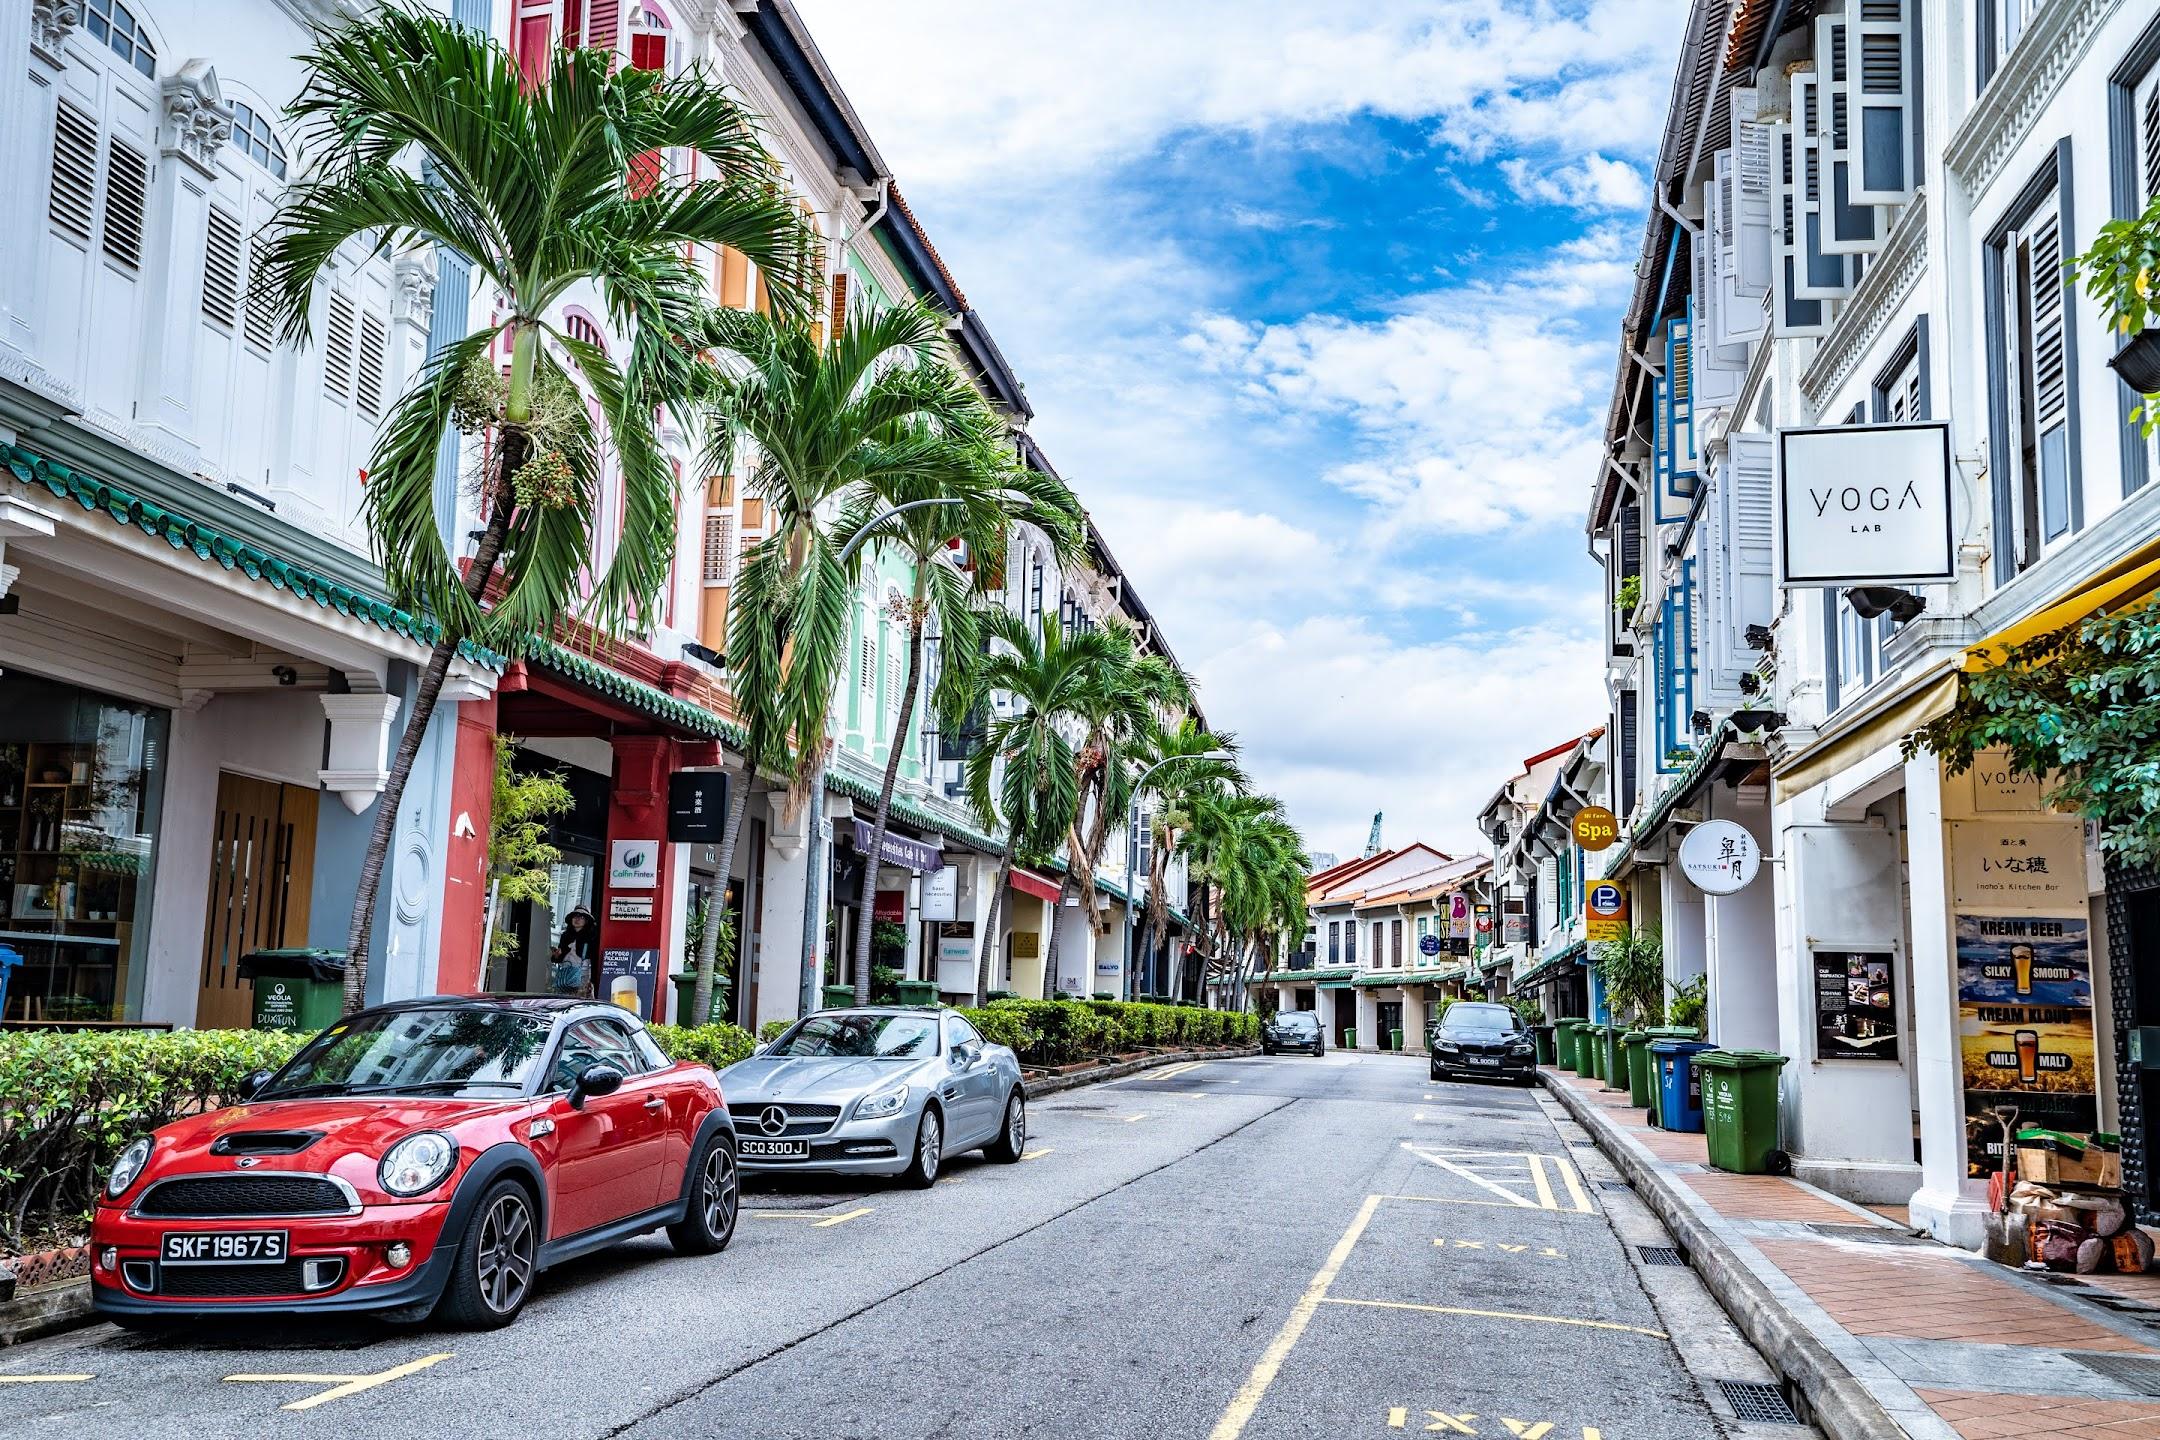 Singapore shop house2